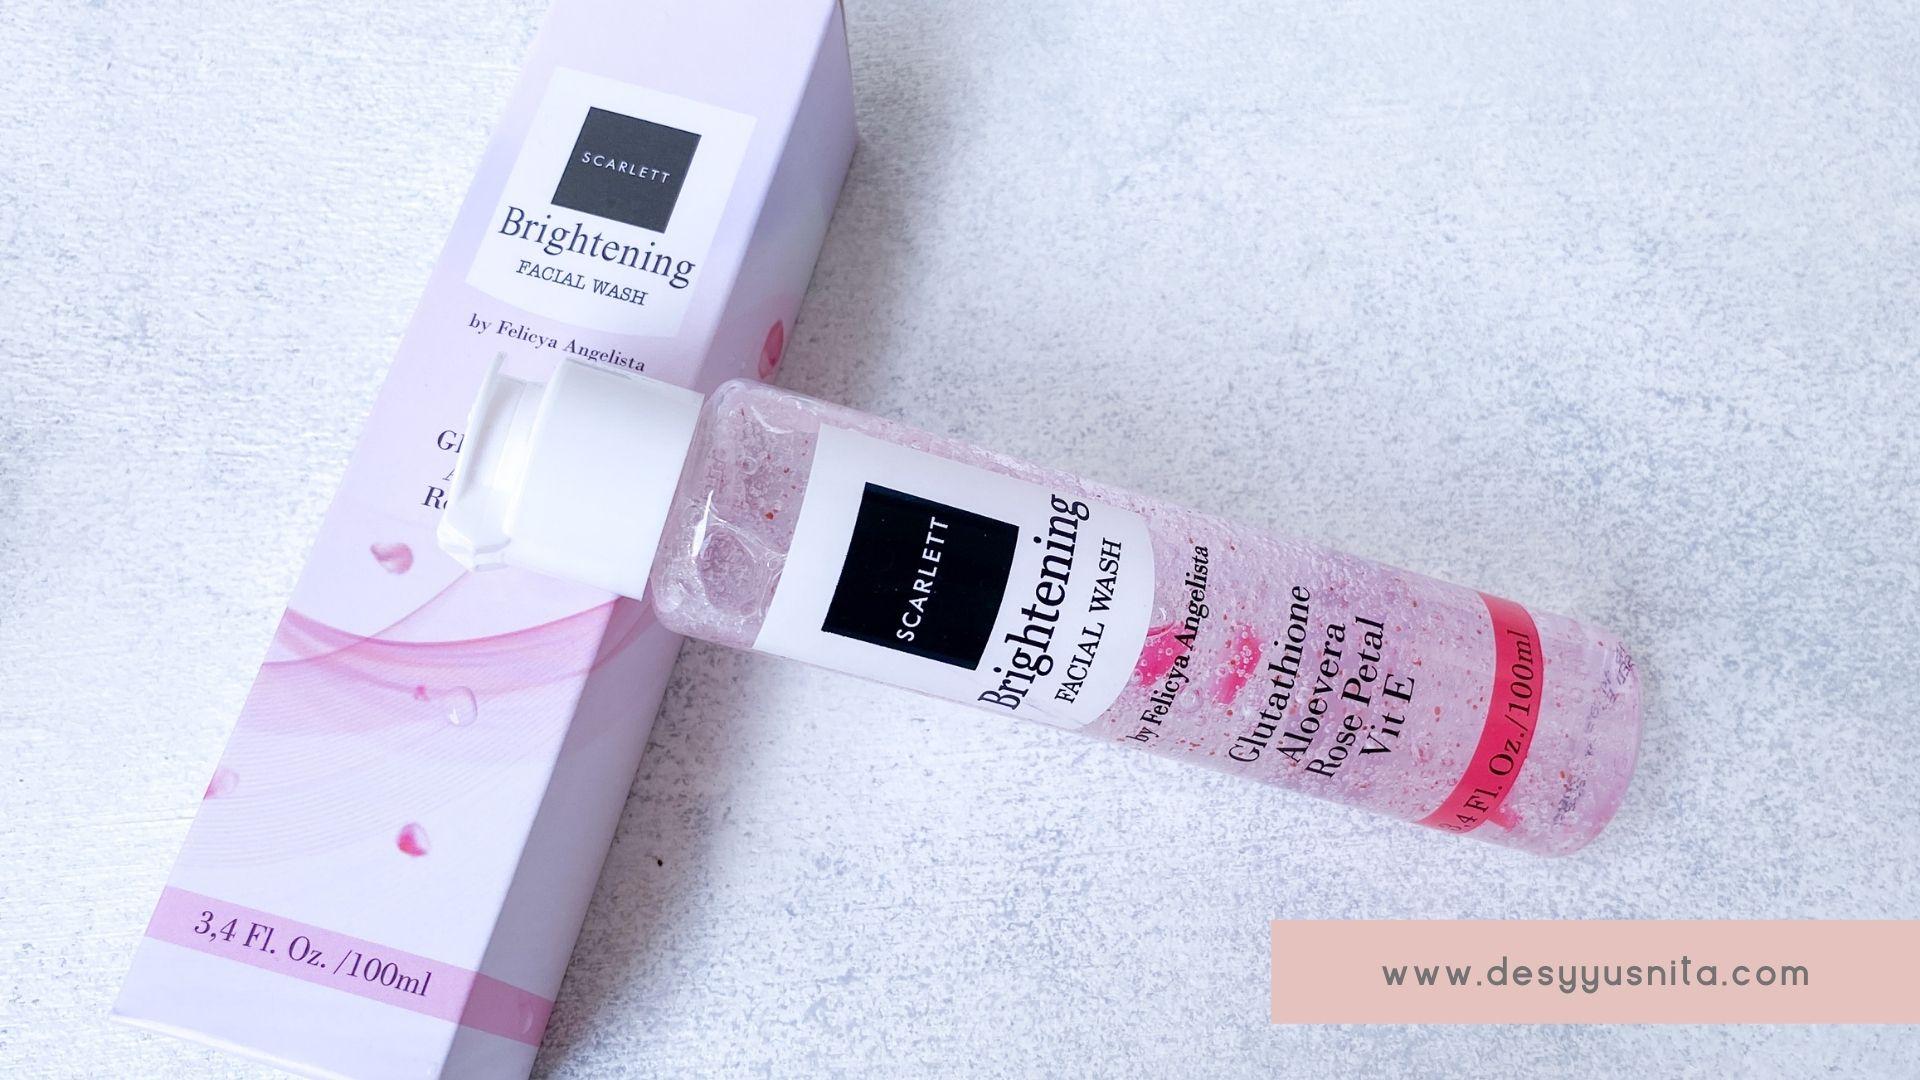 Scarlett Whitening Face Care Brightening Facial Wash